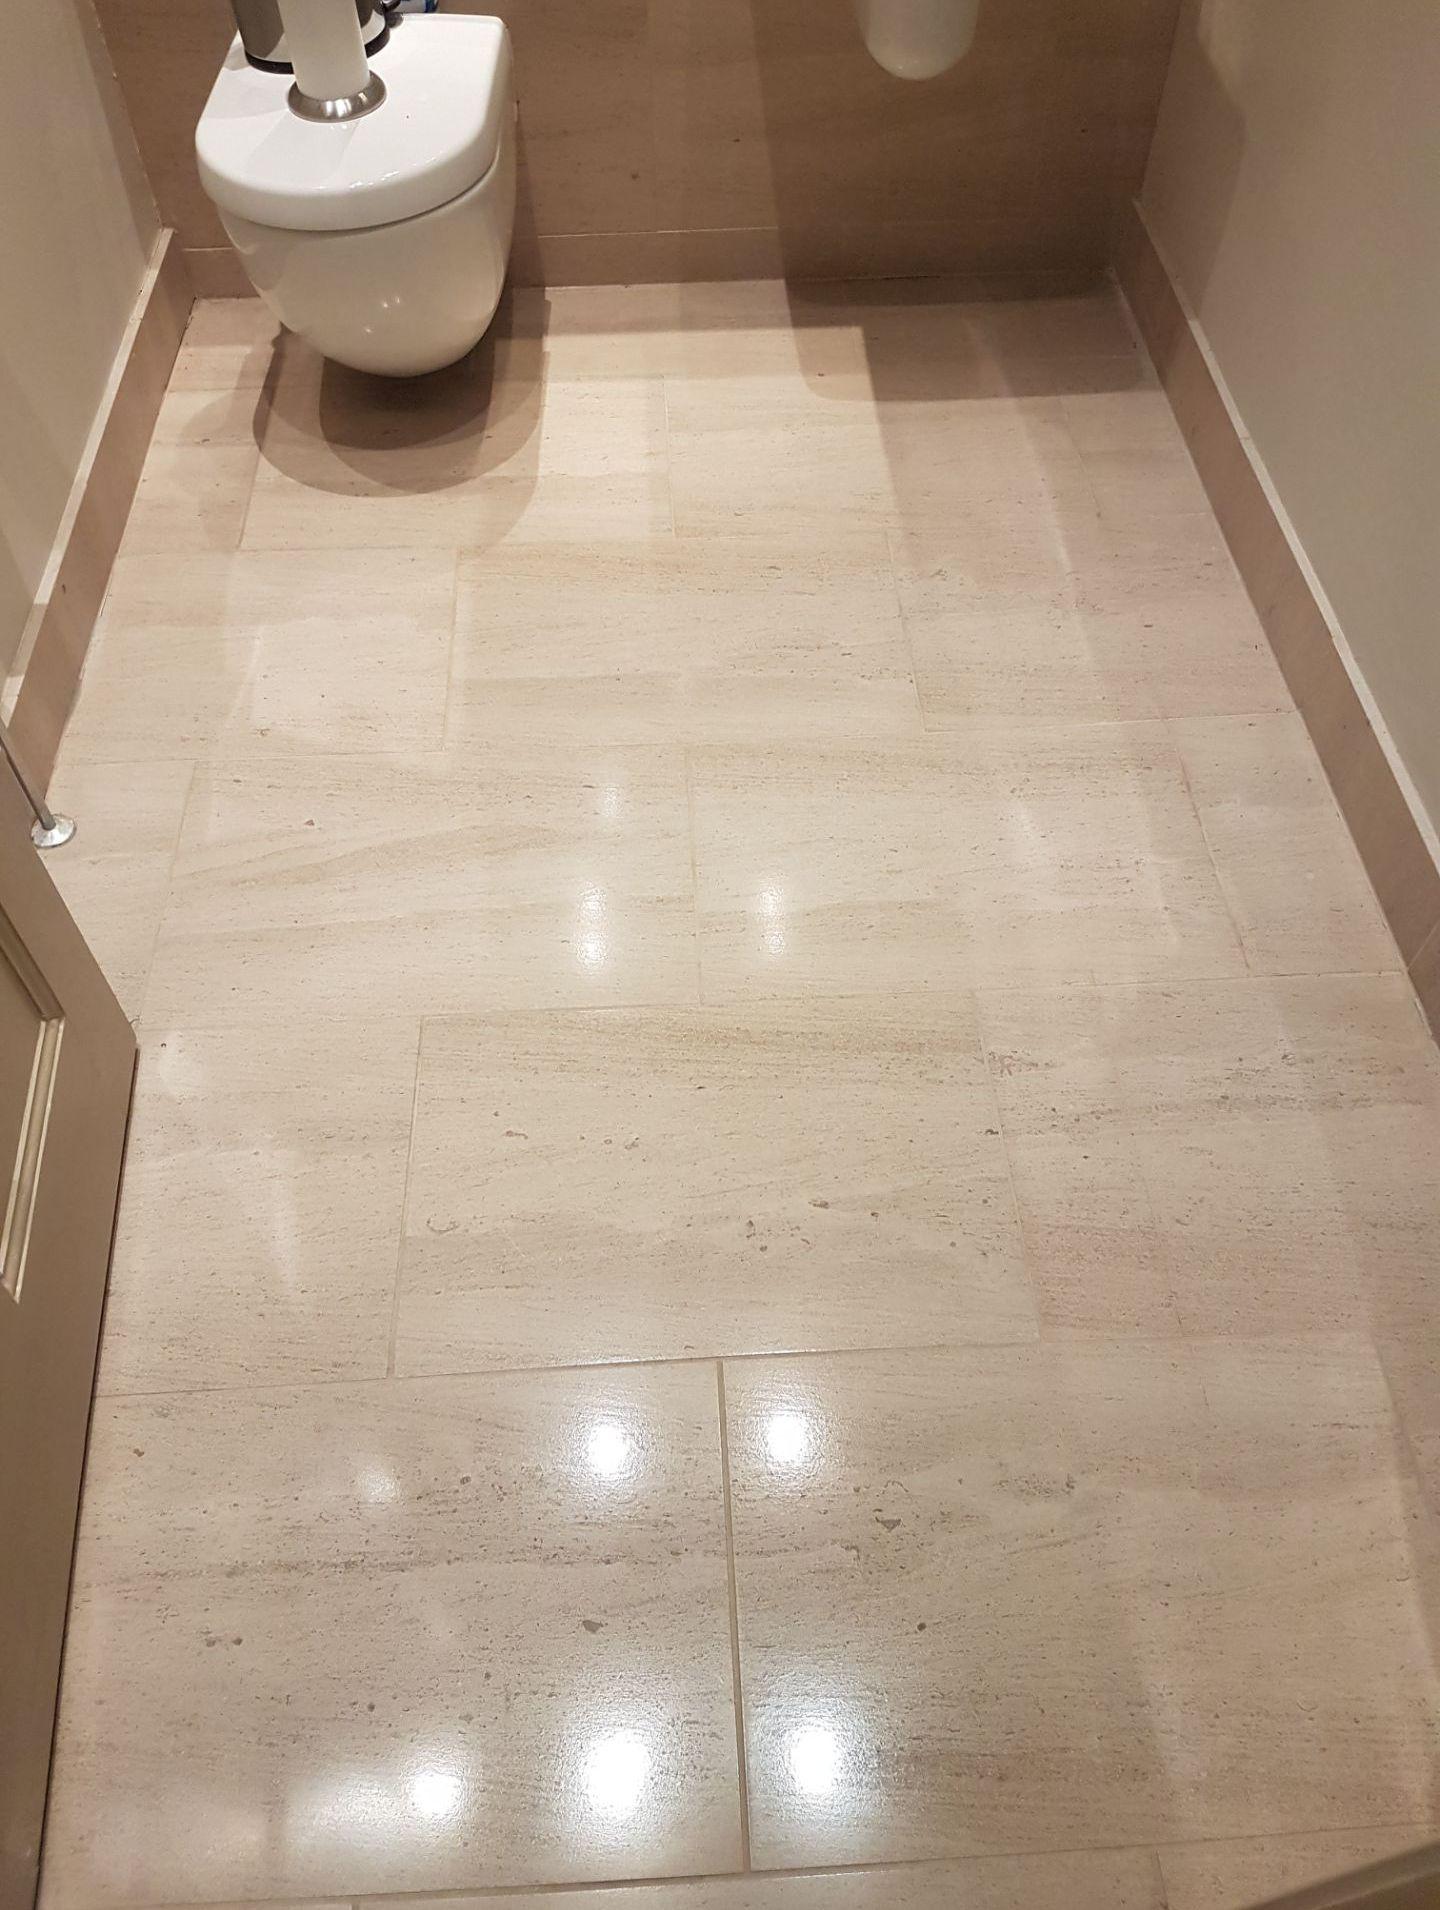 Limestone downstairs toilet Floor Merchiston after